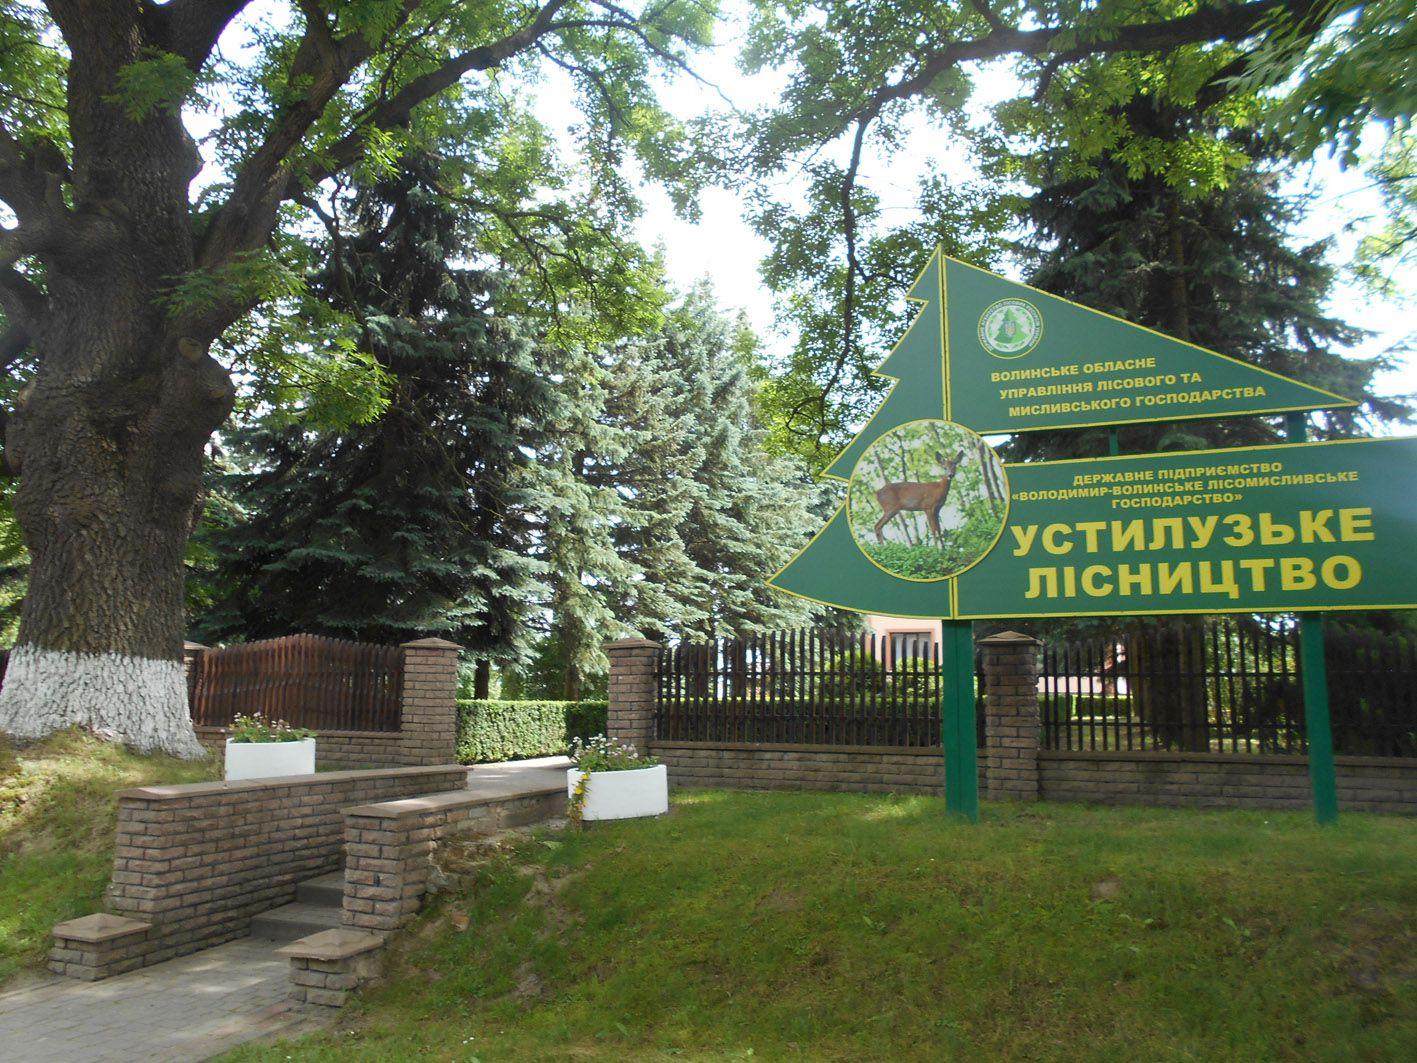 Во Владимир-Волынском районе отсудили лес